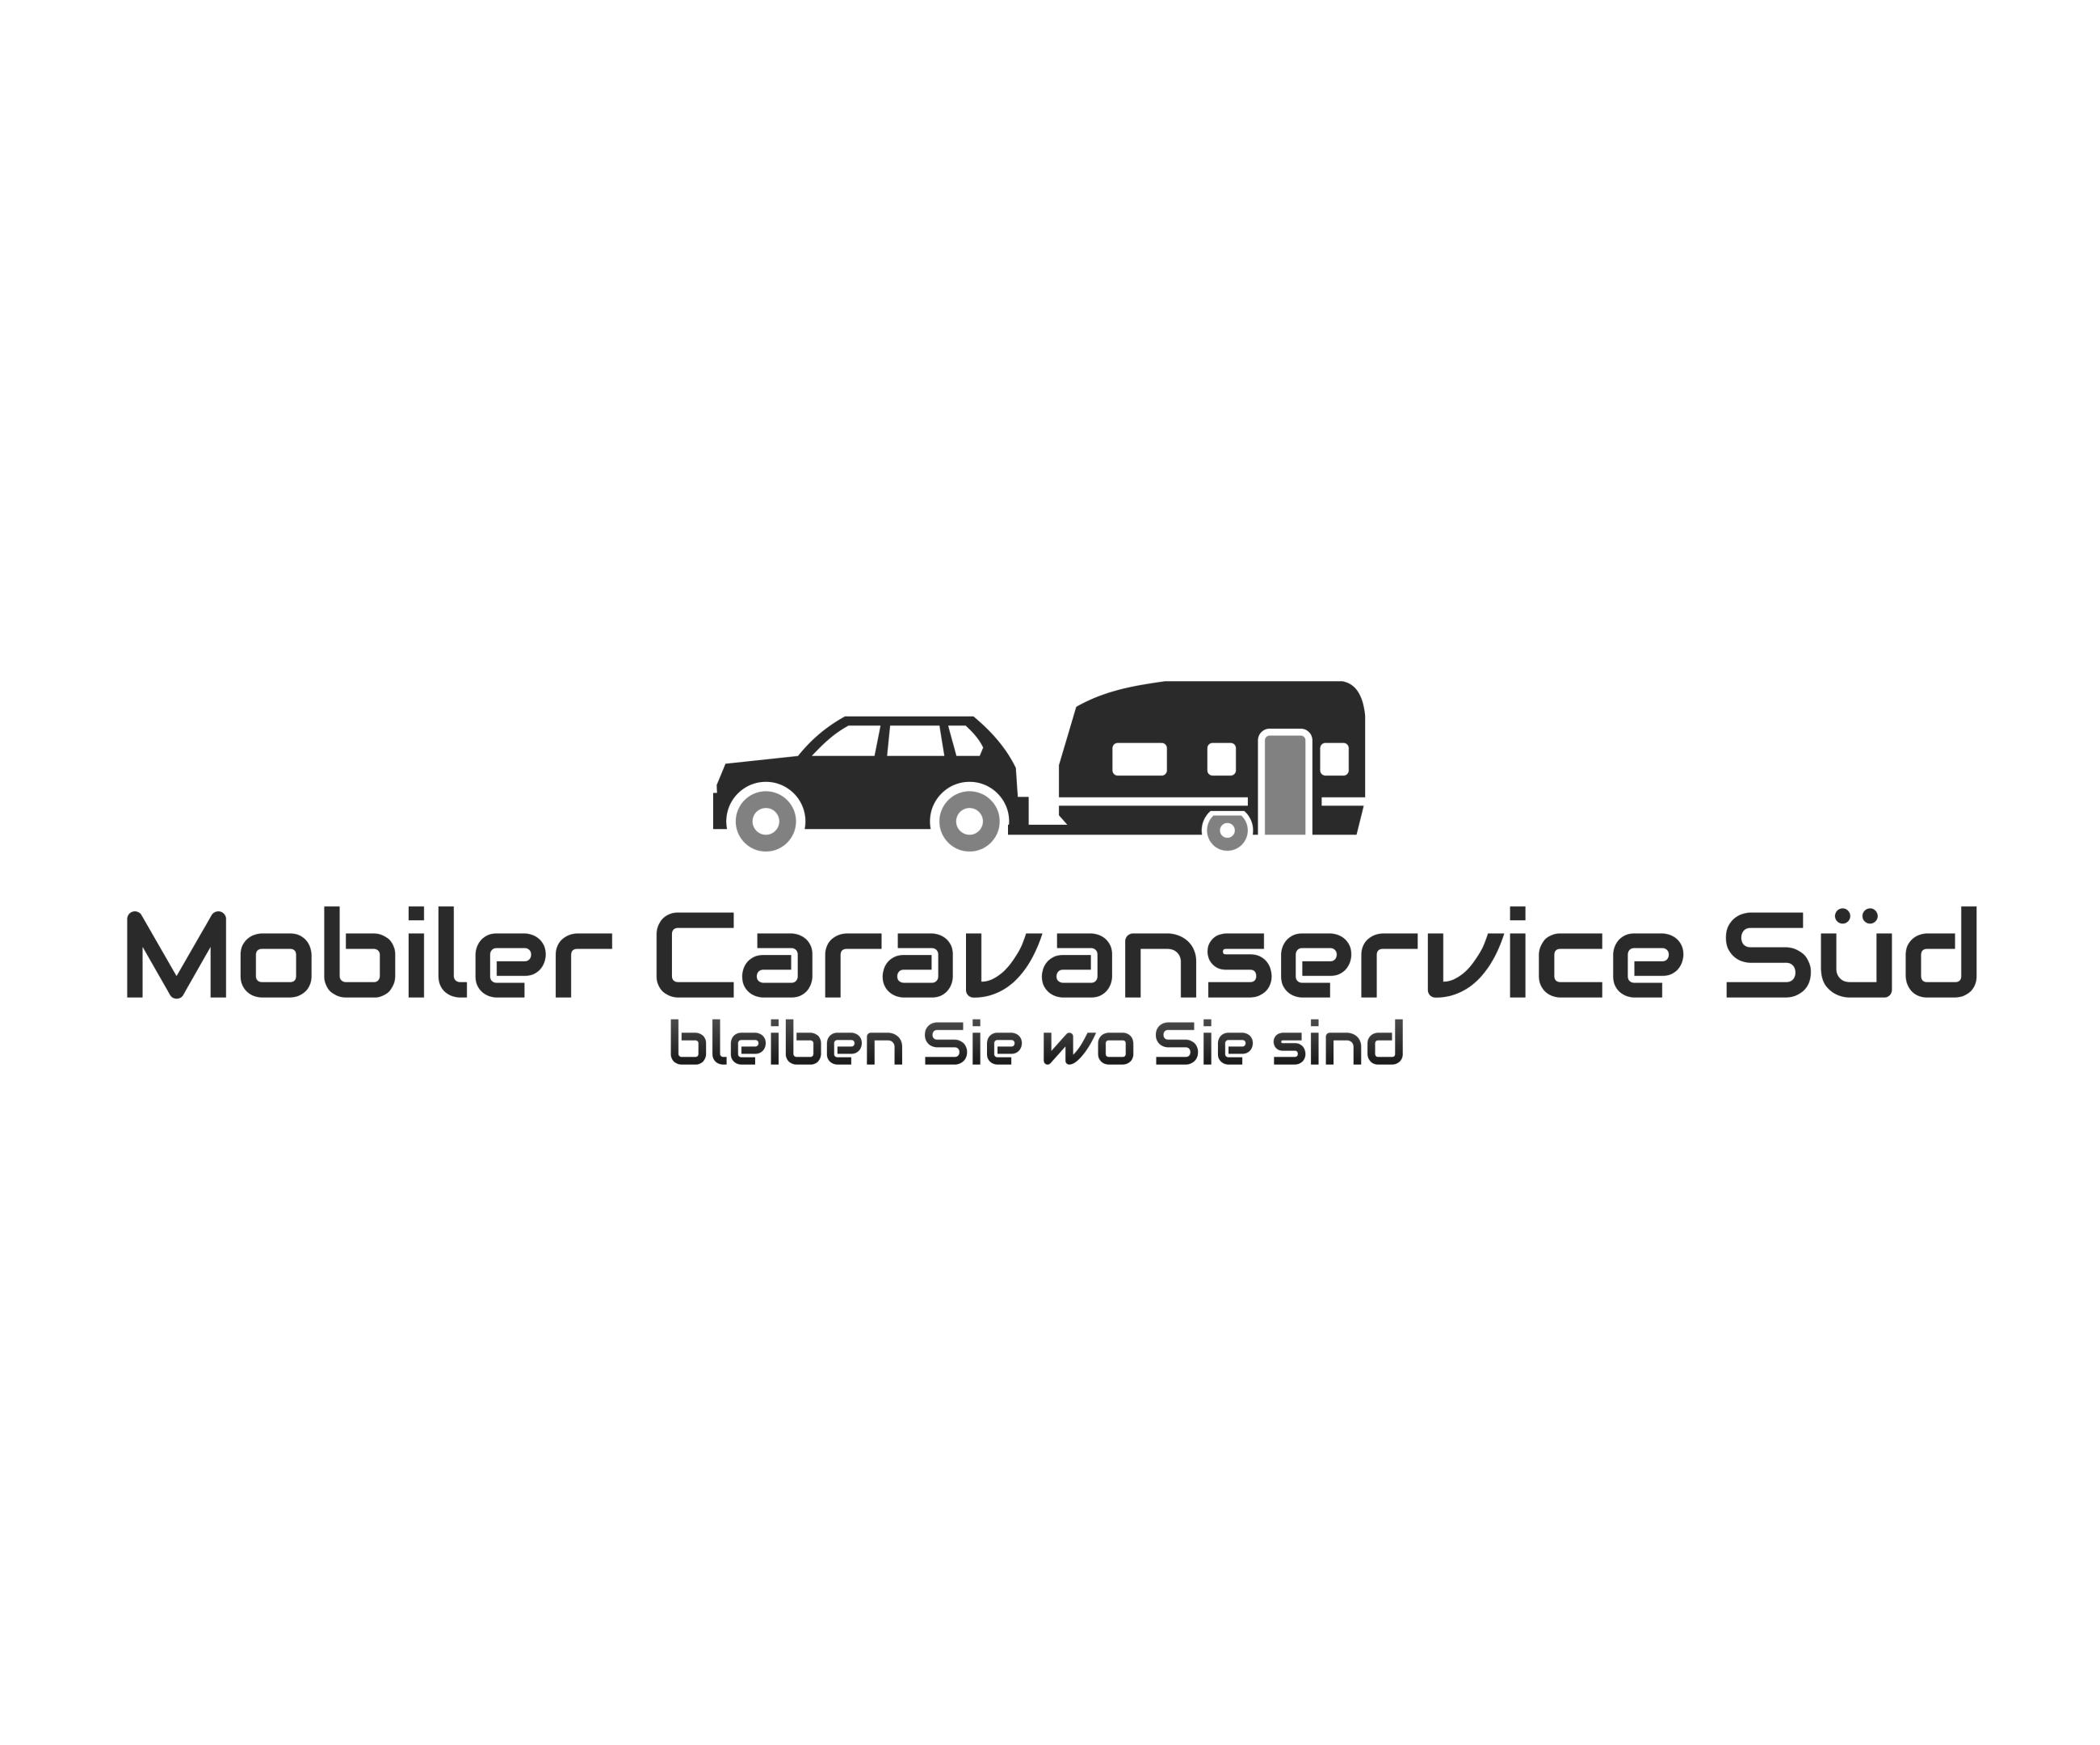 Mobiler Caravanservice Süd